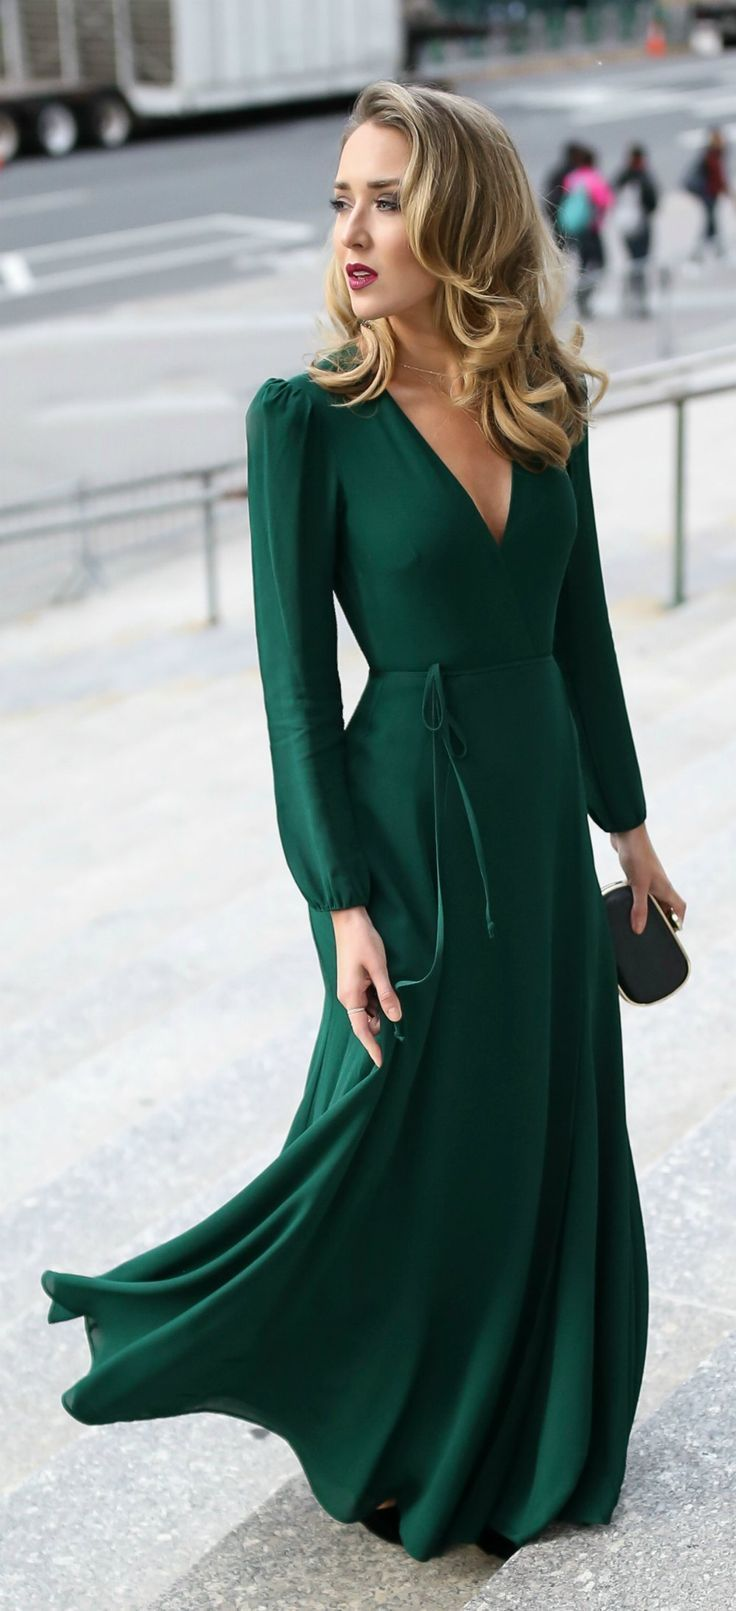 dresses in days black tie wedding guest emerald green long